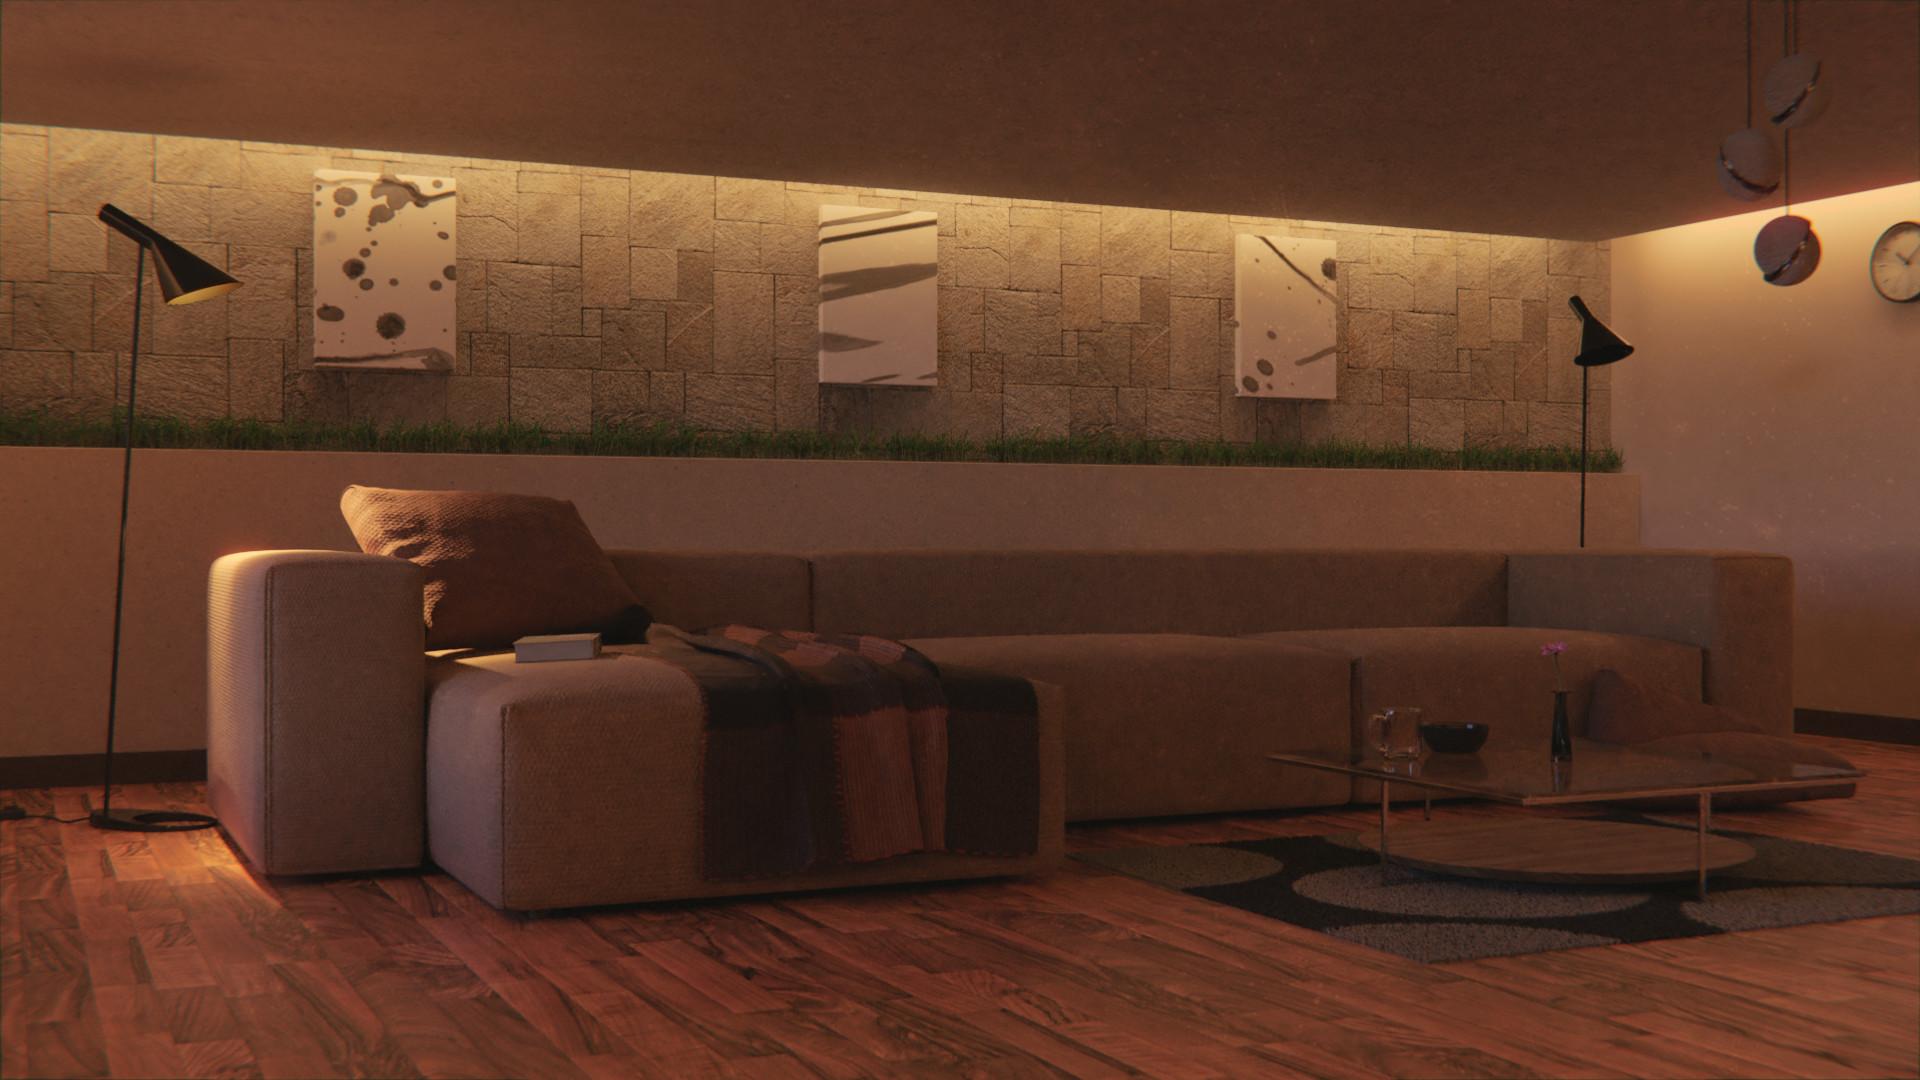 Vinicius hernandes livingroom noitepros2